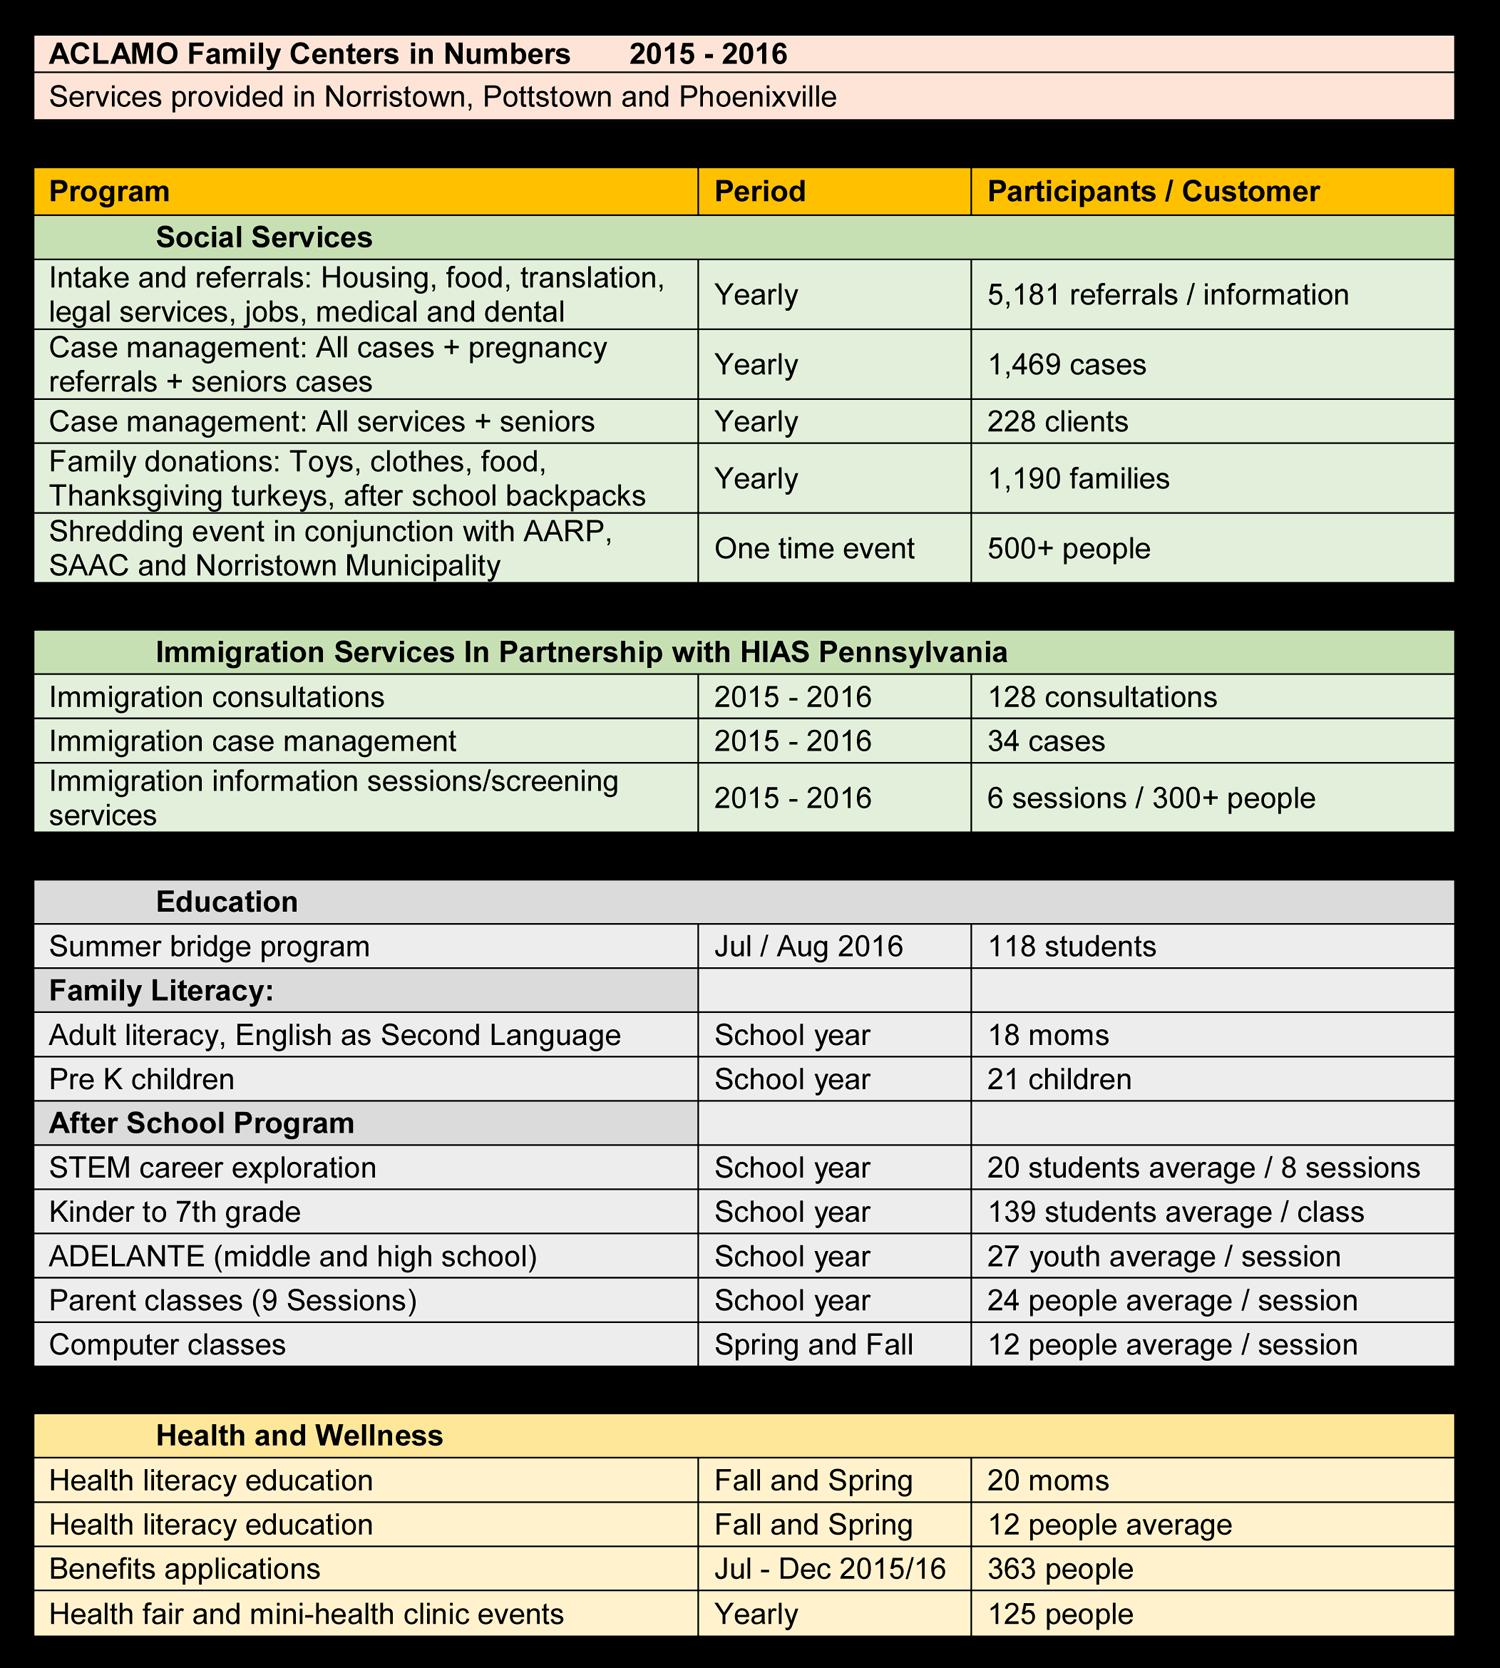 ACLAMO-2016-results